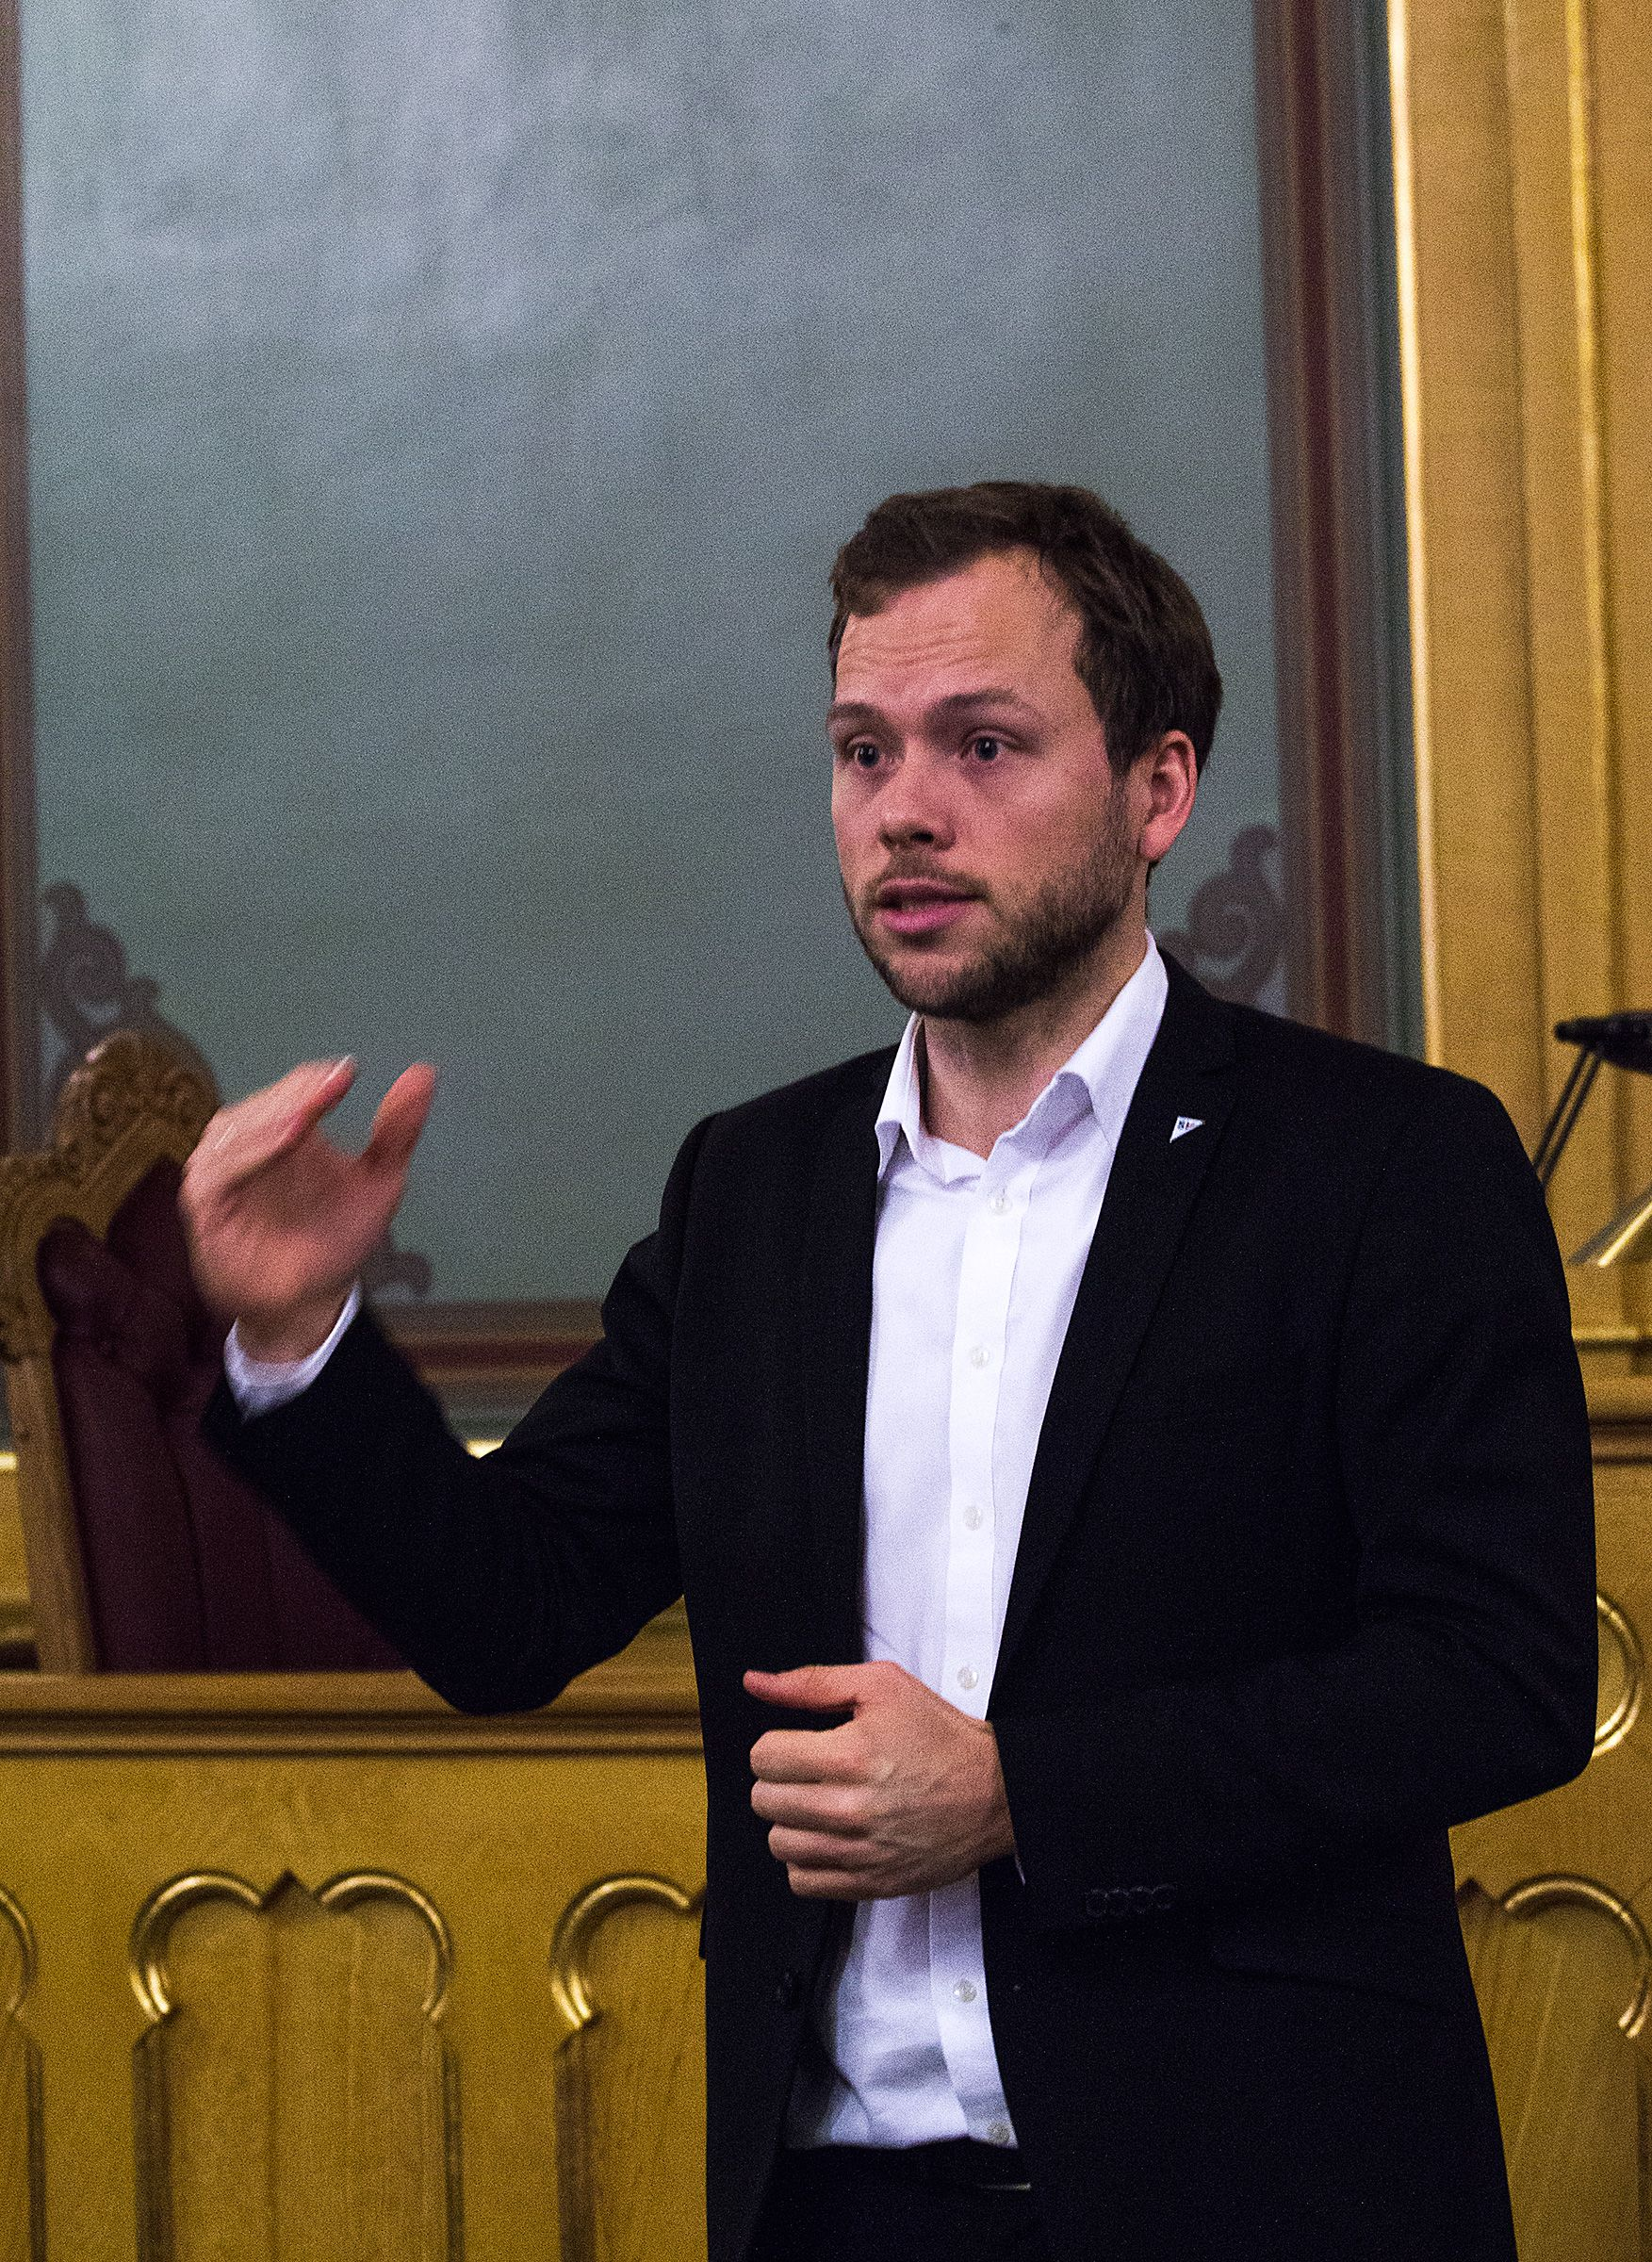 Audun Lysbakken, Sosialistisk Venstreparti.Foto: Varg Aamo, Hardware.no